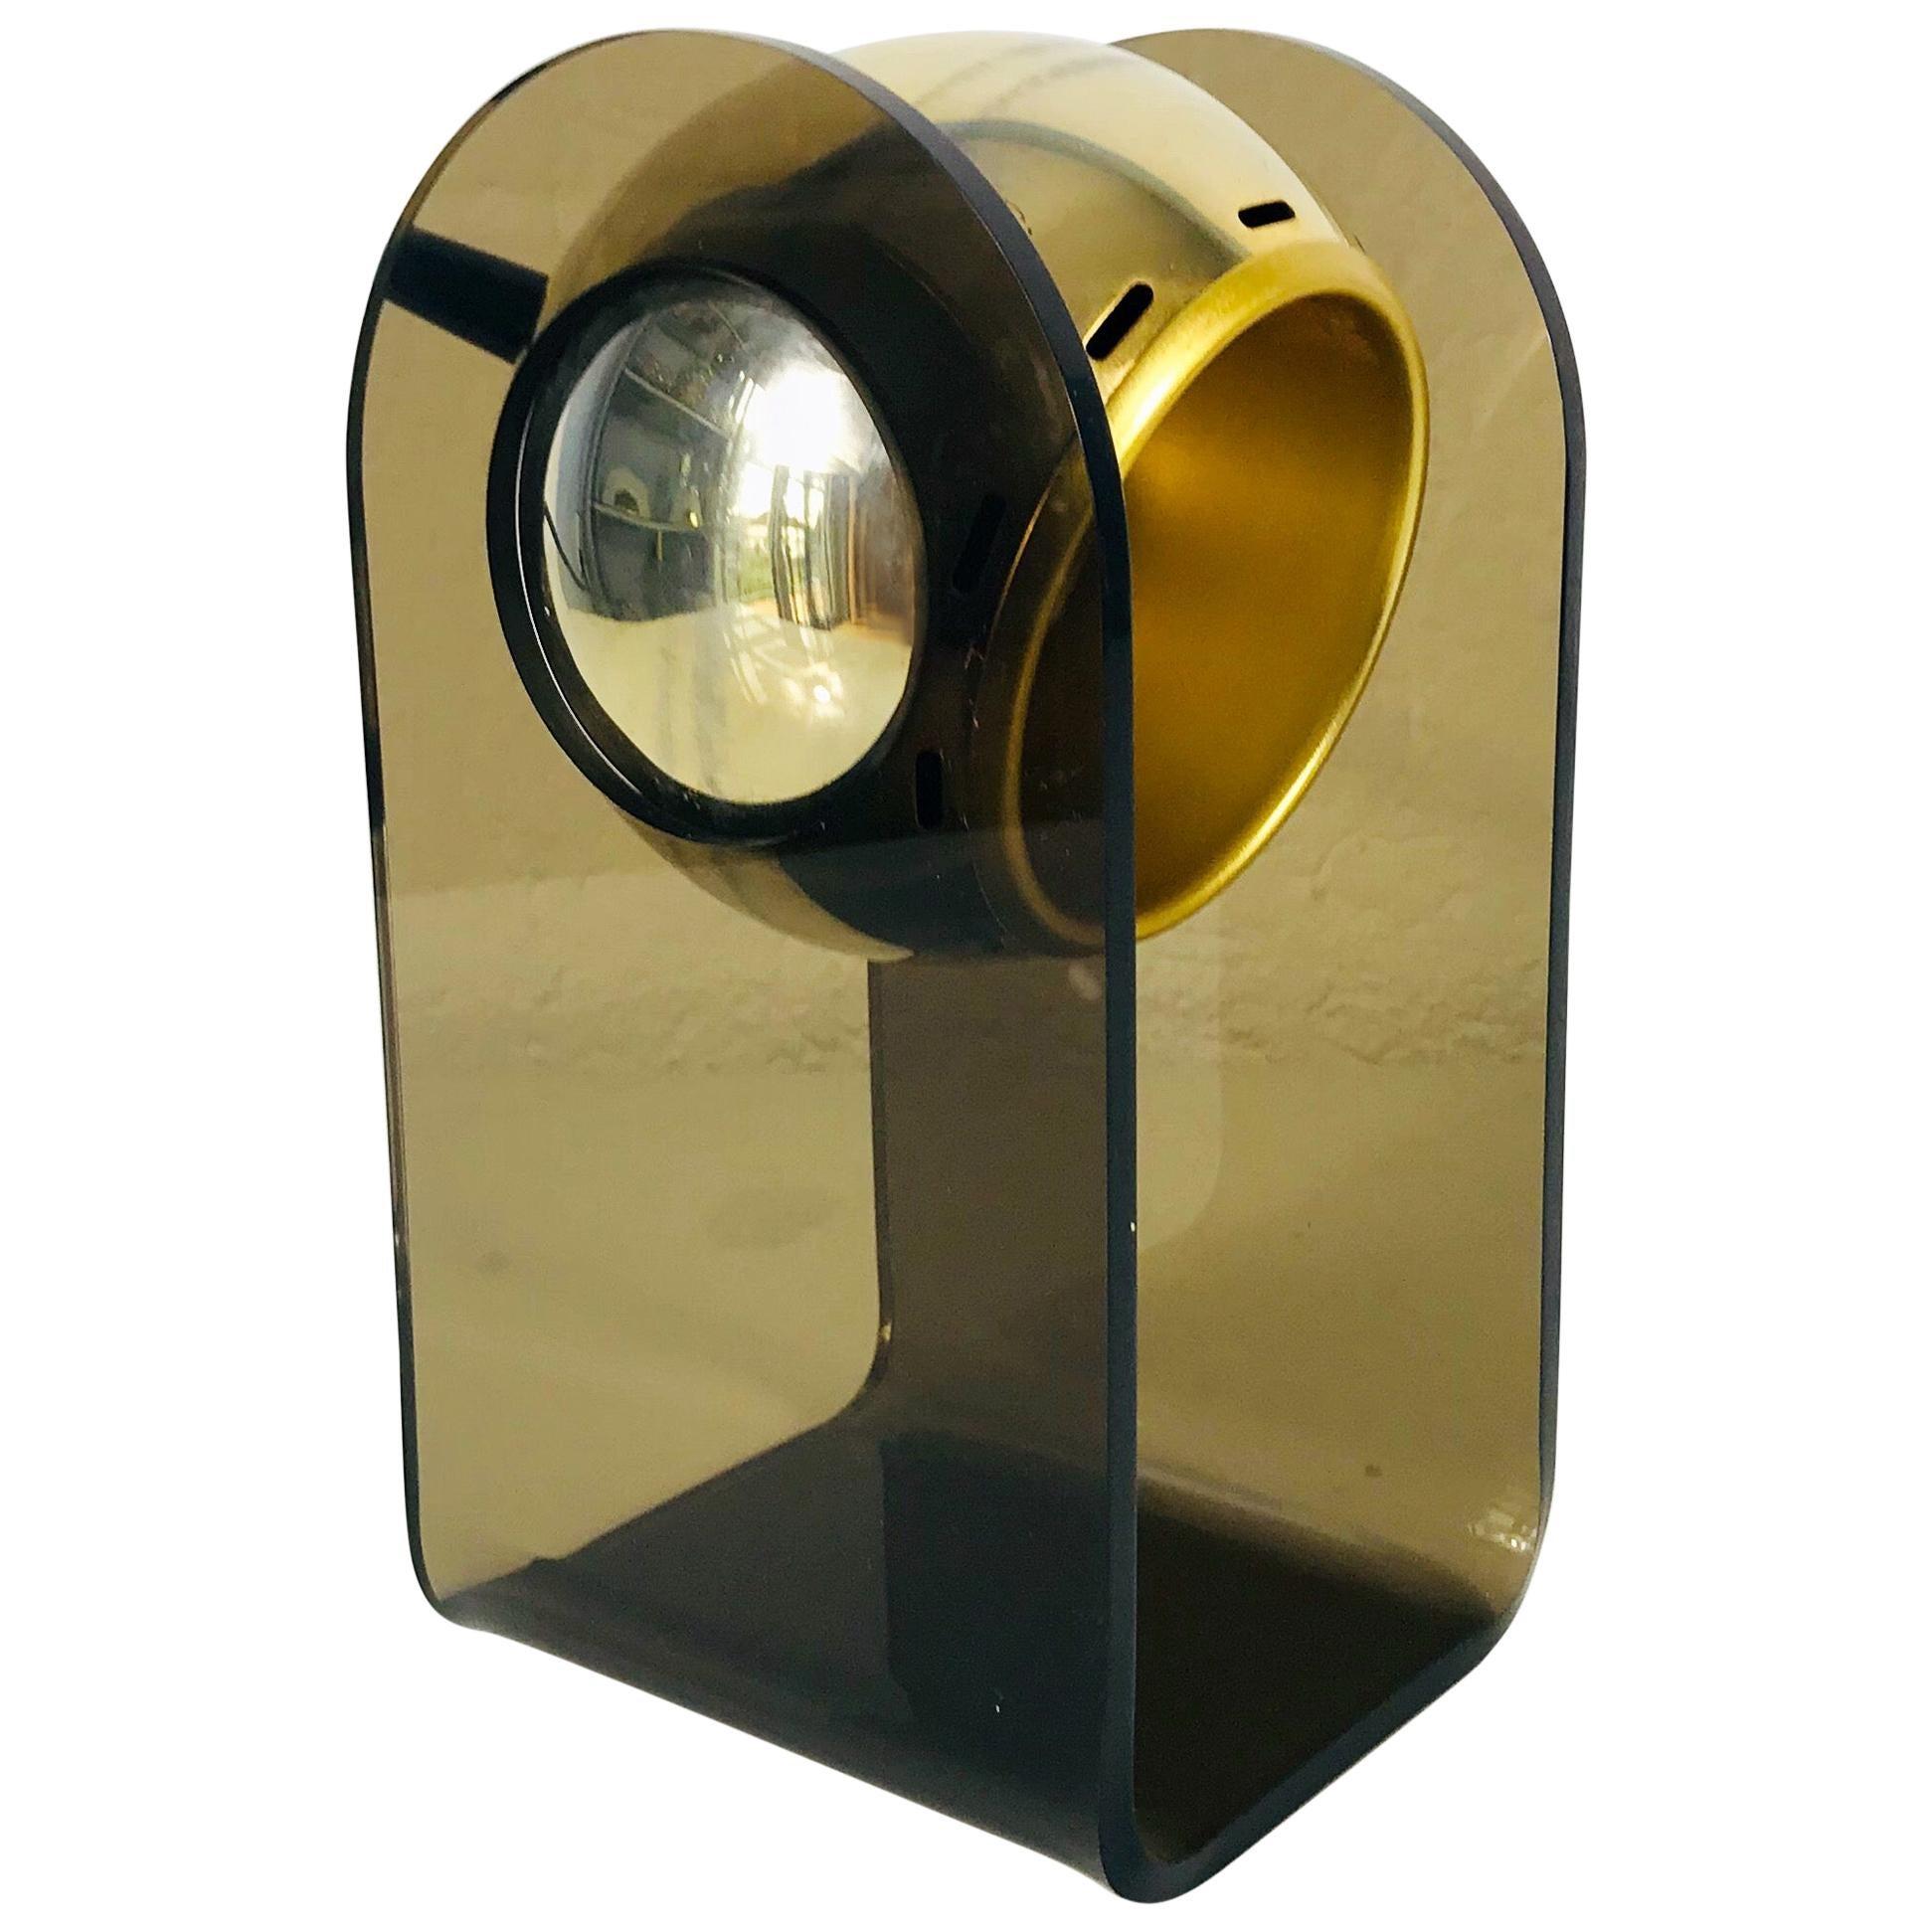 Gino Sarfatti Table Lamp Model 540P for Arteluce, Italy, 1968